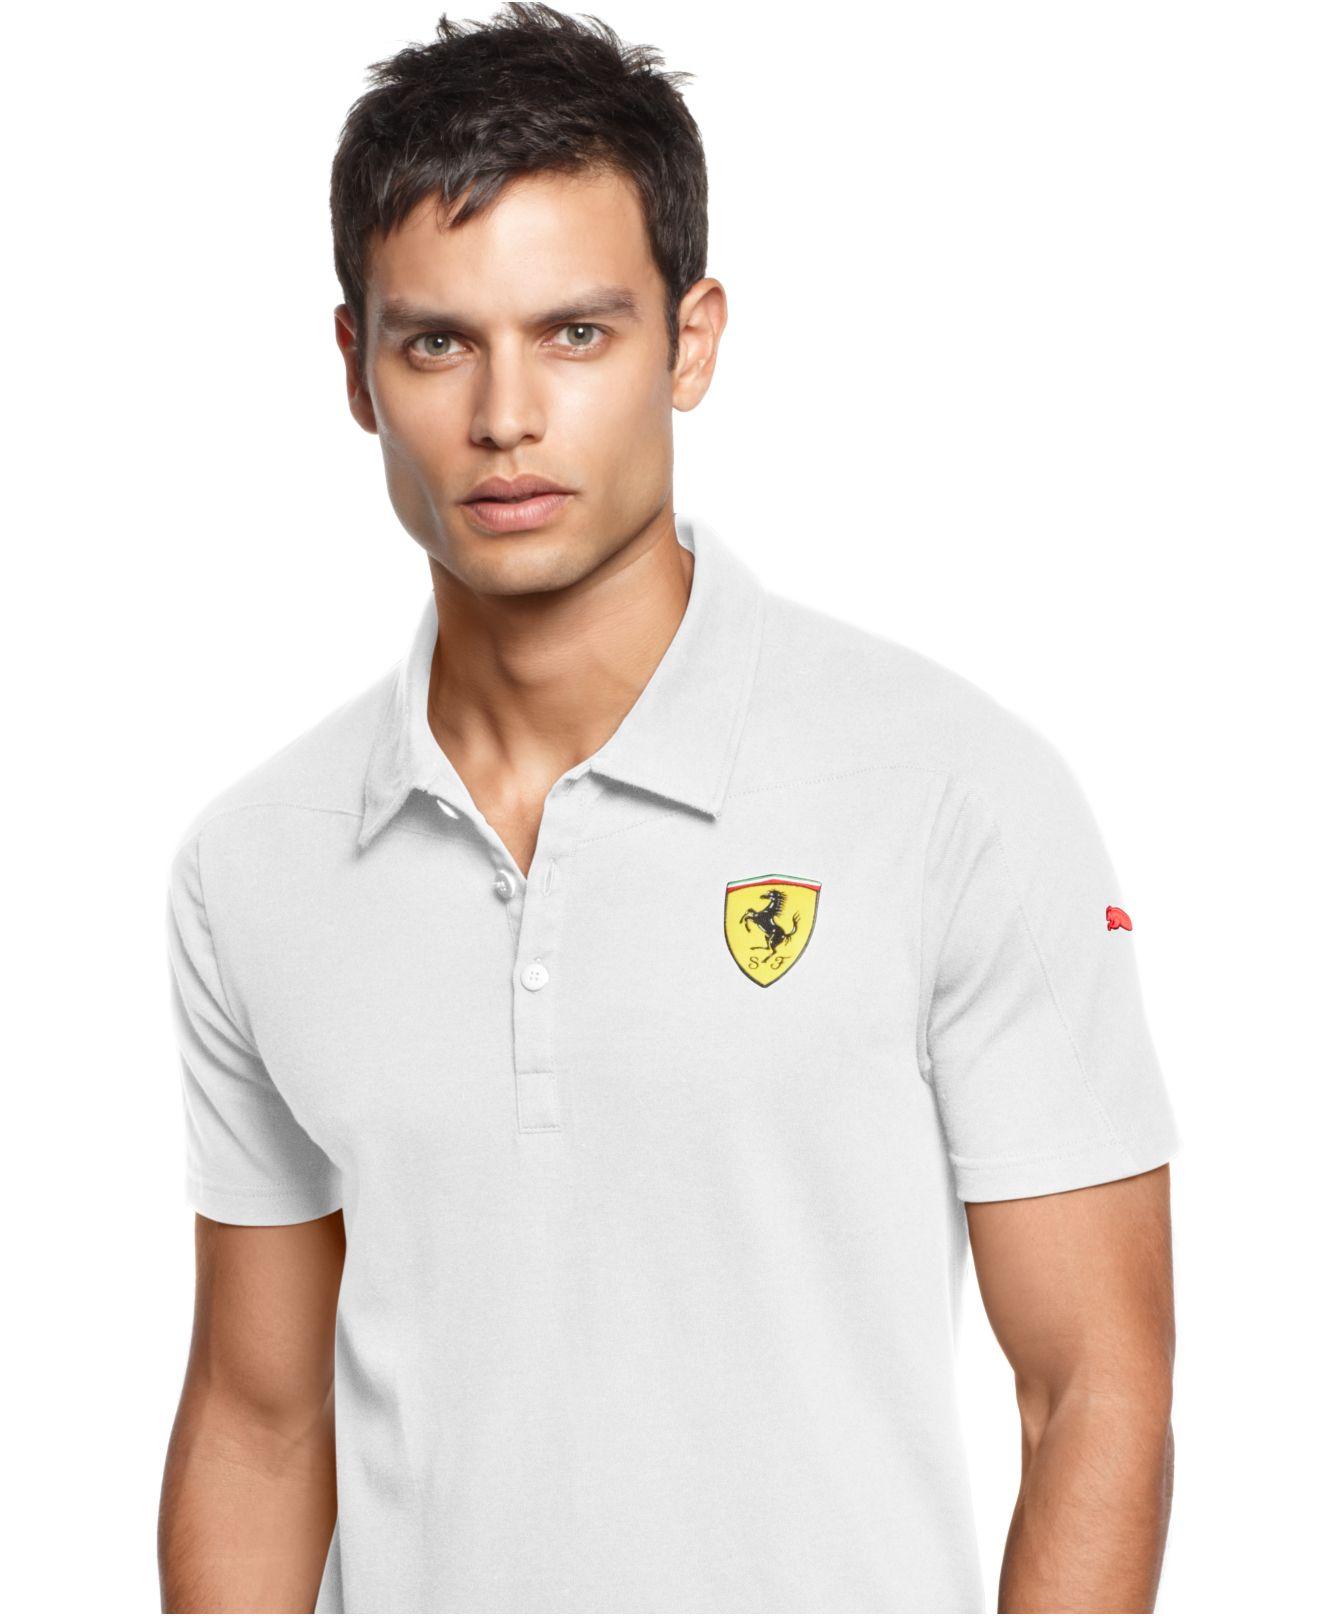 puma usa essential men t p ferrari s design tshirts scuderia clothing mens no innovative black sleeveless shirts